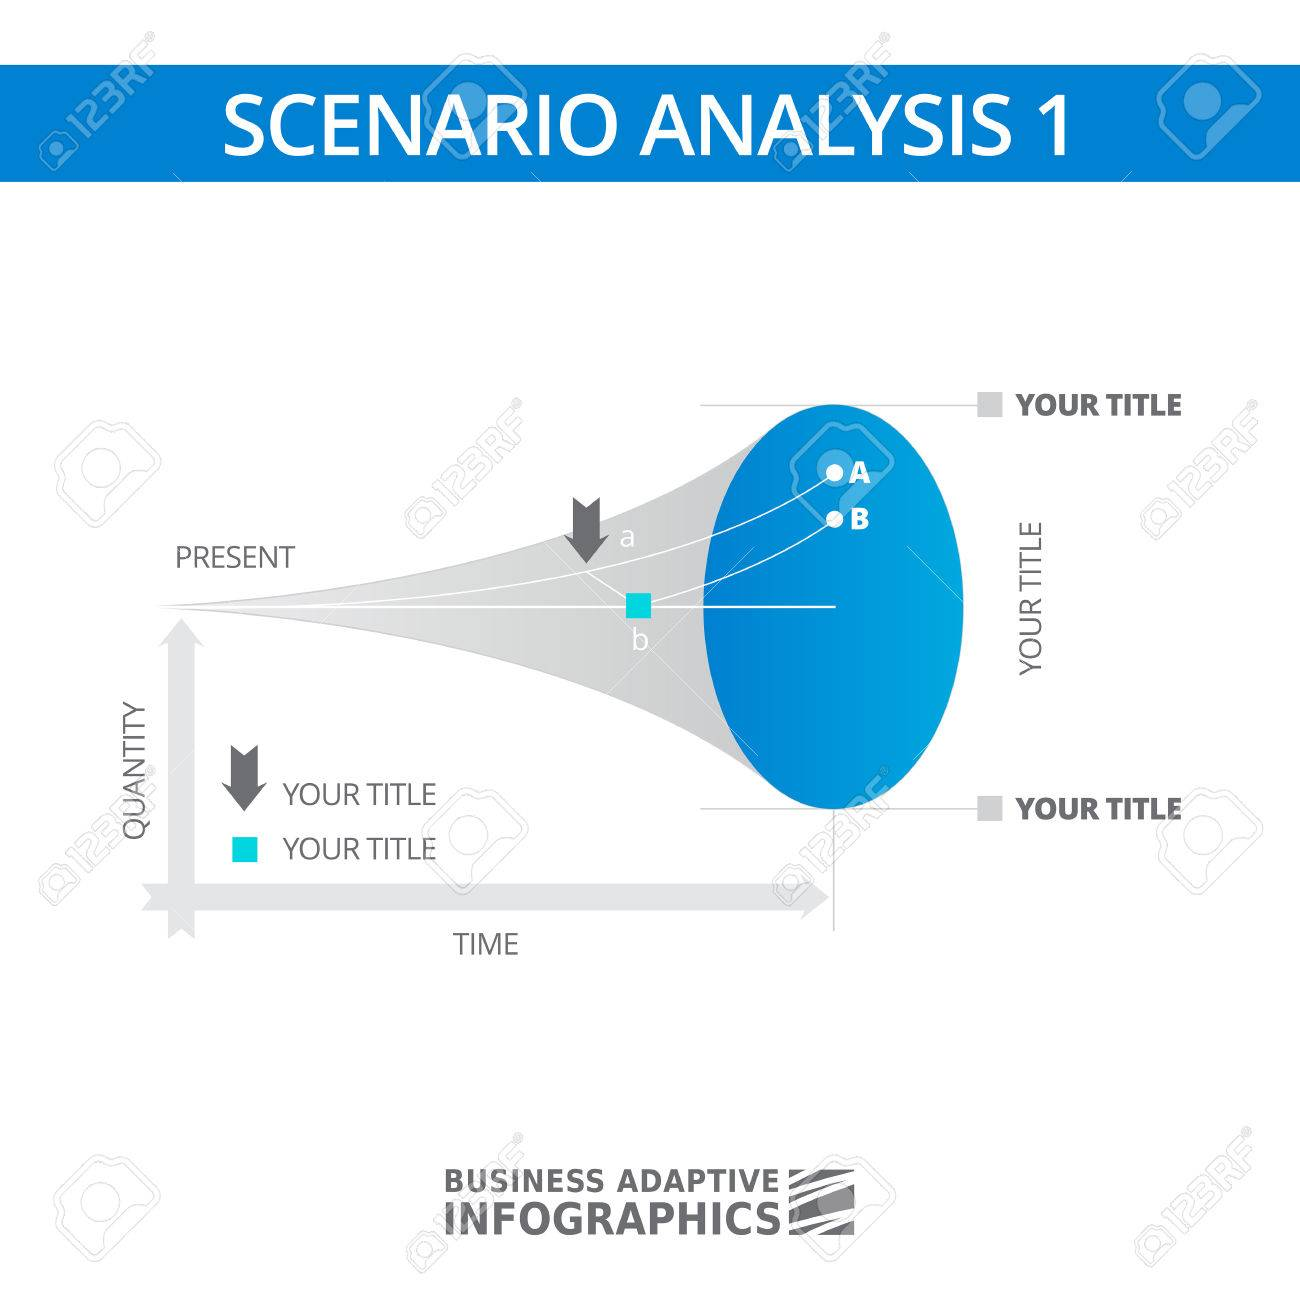 Editable Infographic Template Of Scenario Analysis Diagram Royalty ...